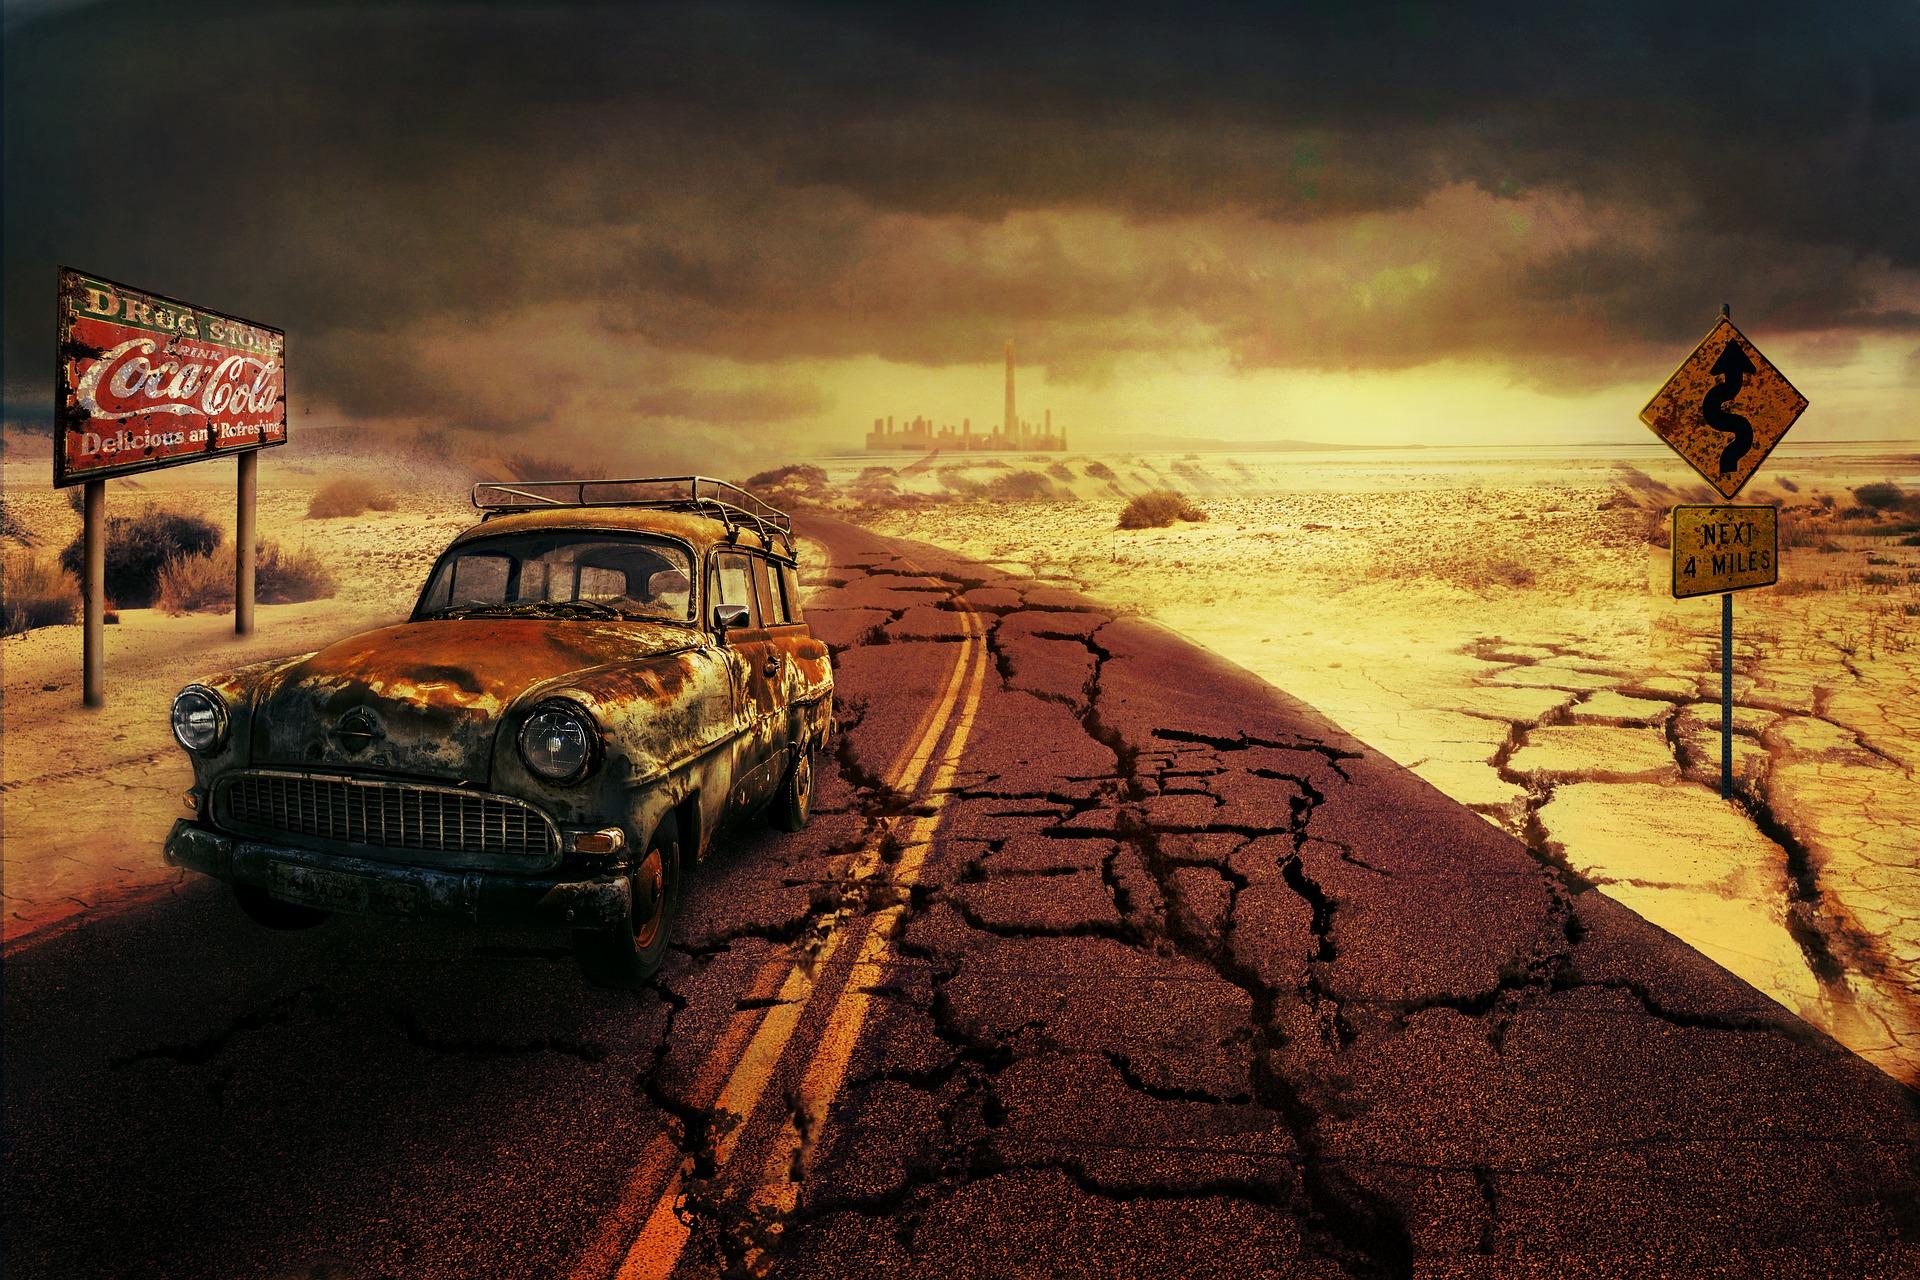 apocalypse-3880495_1920.jpg